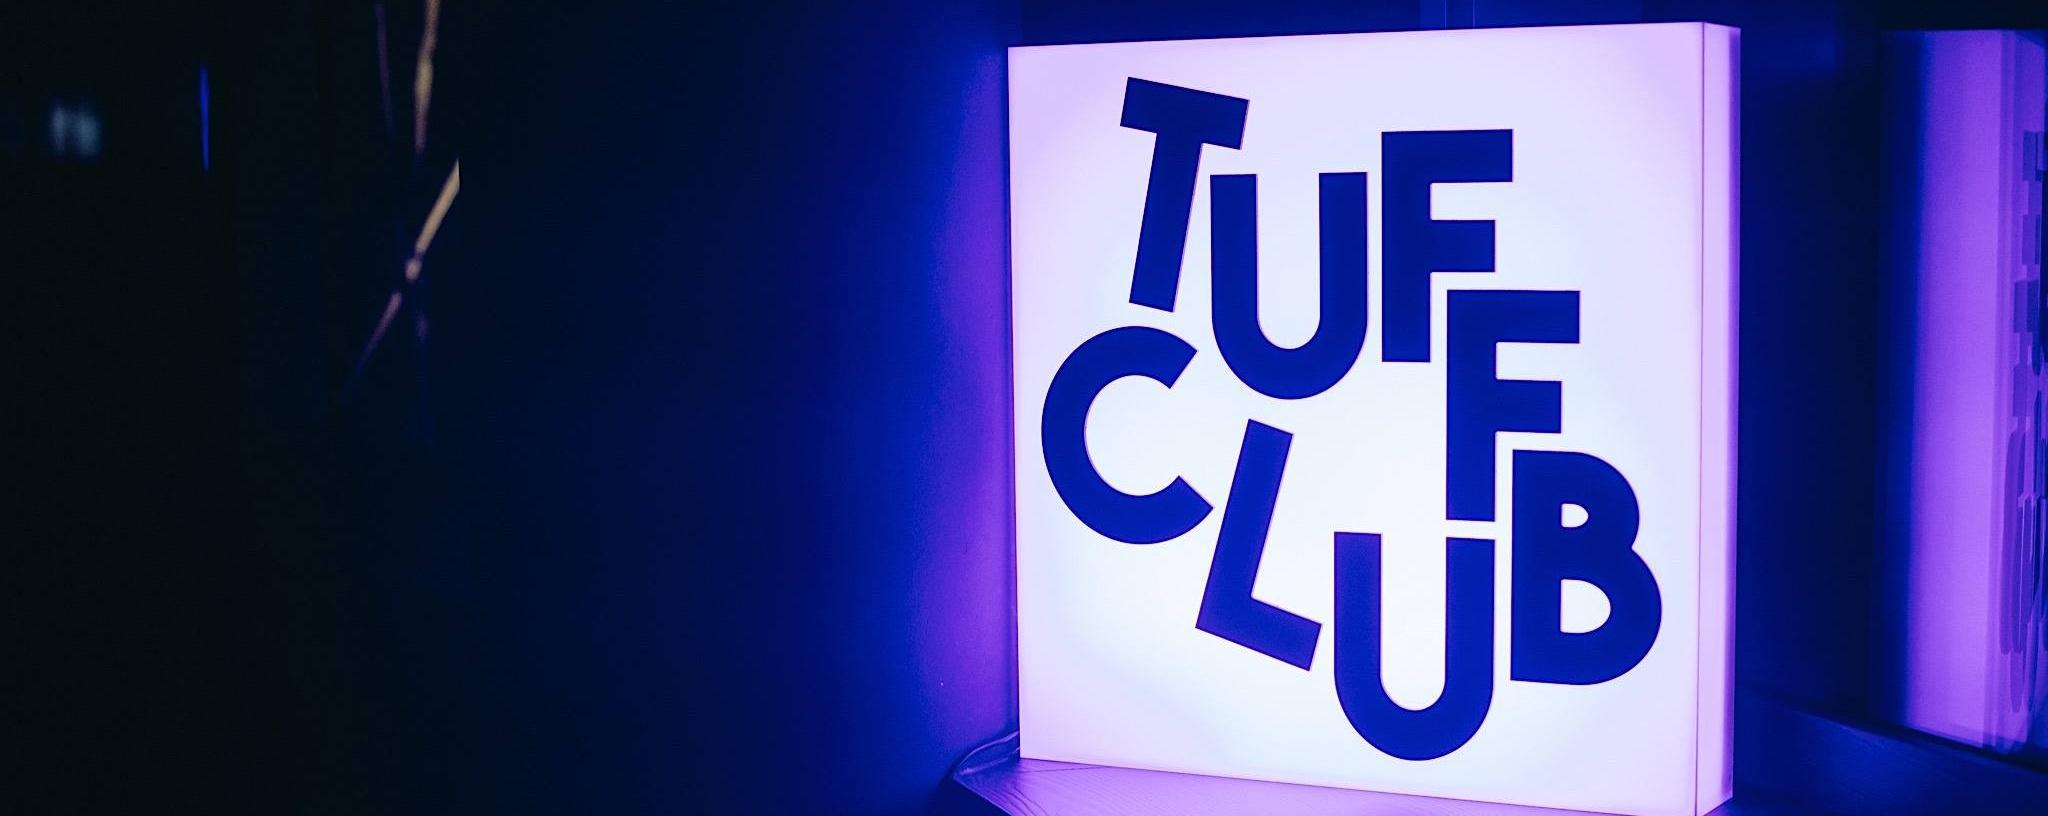 TUFF CLUB x GOOD TIMES